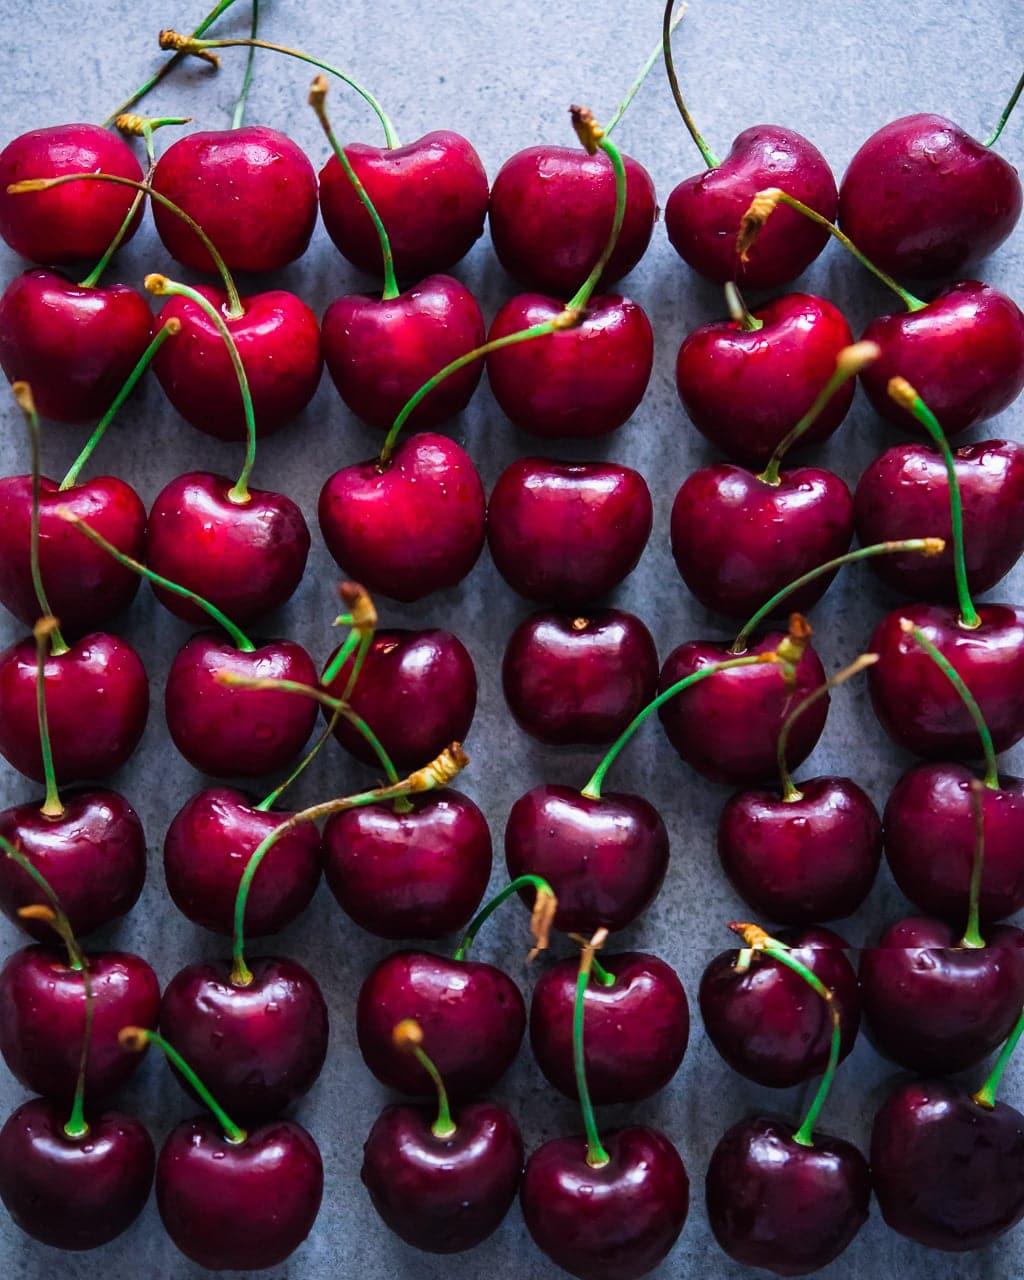 Cherries Fruit Gradient Art Dubai Food Photography